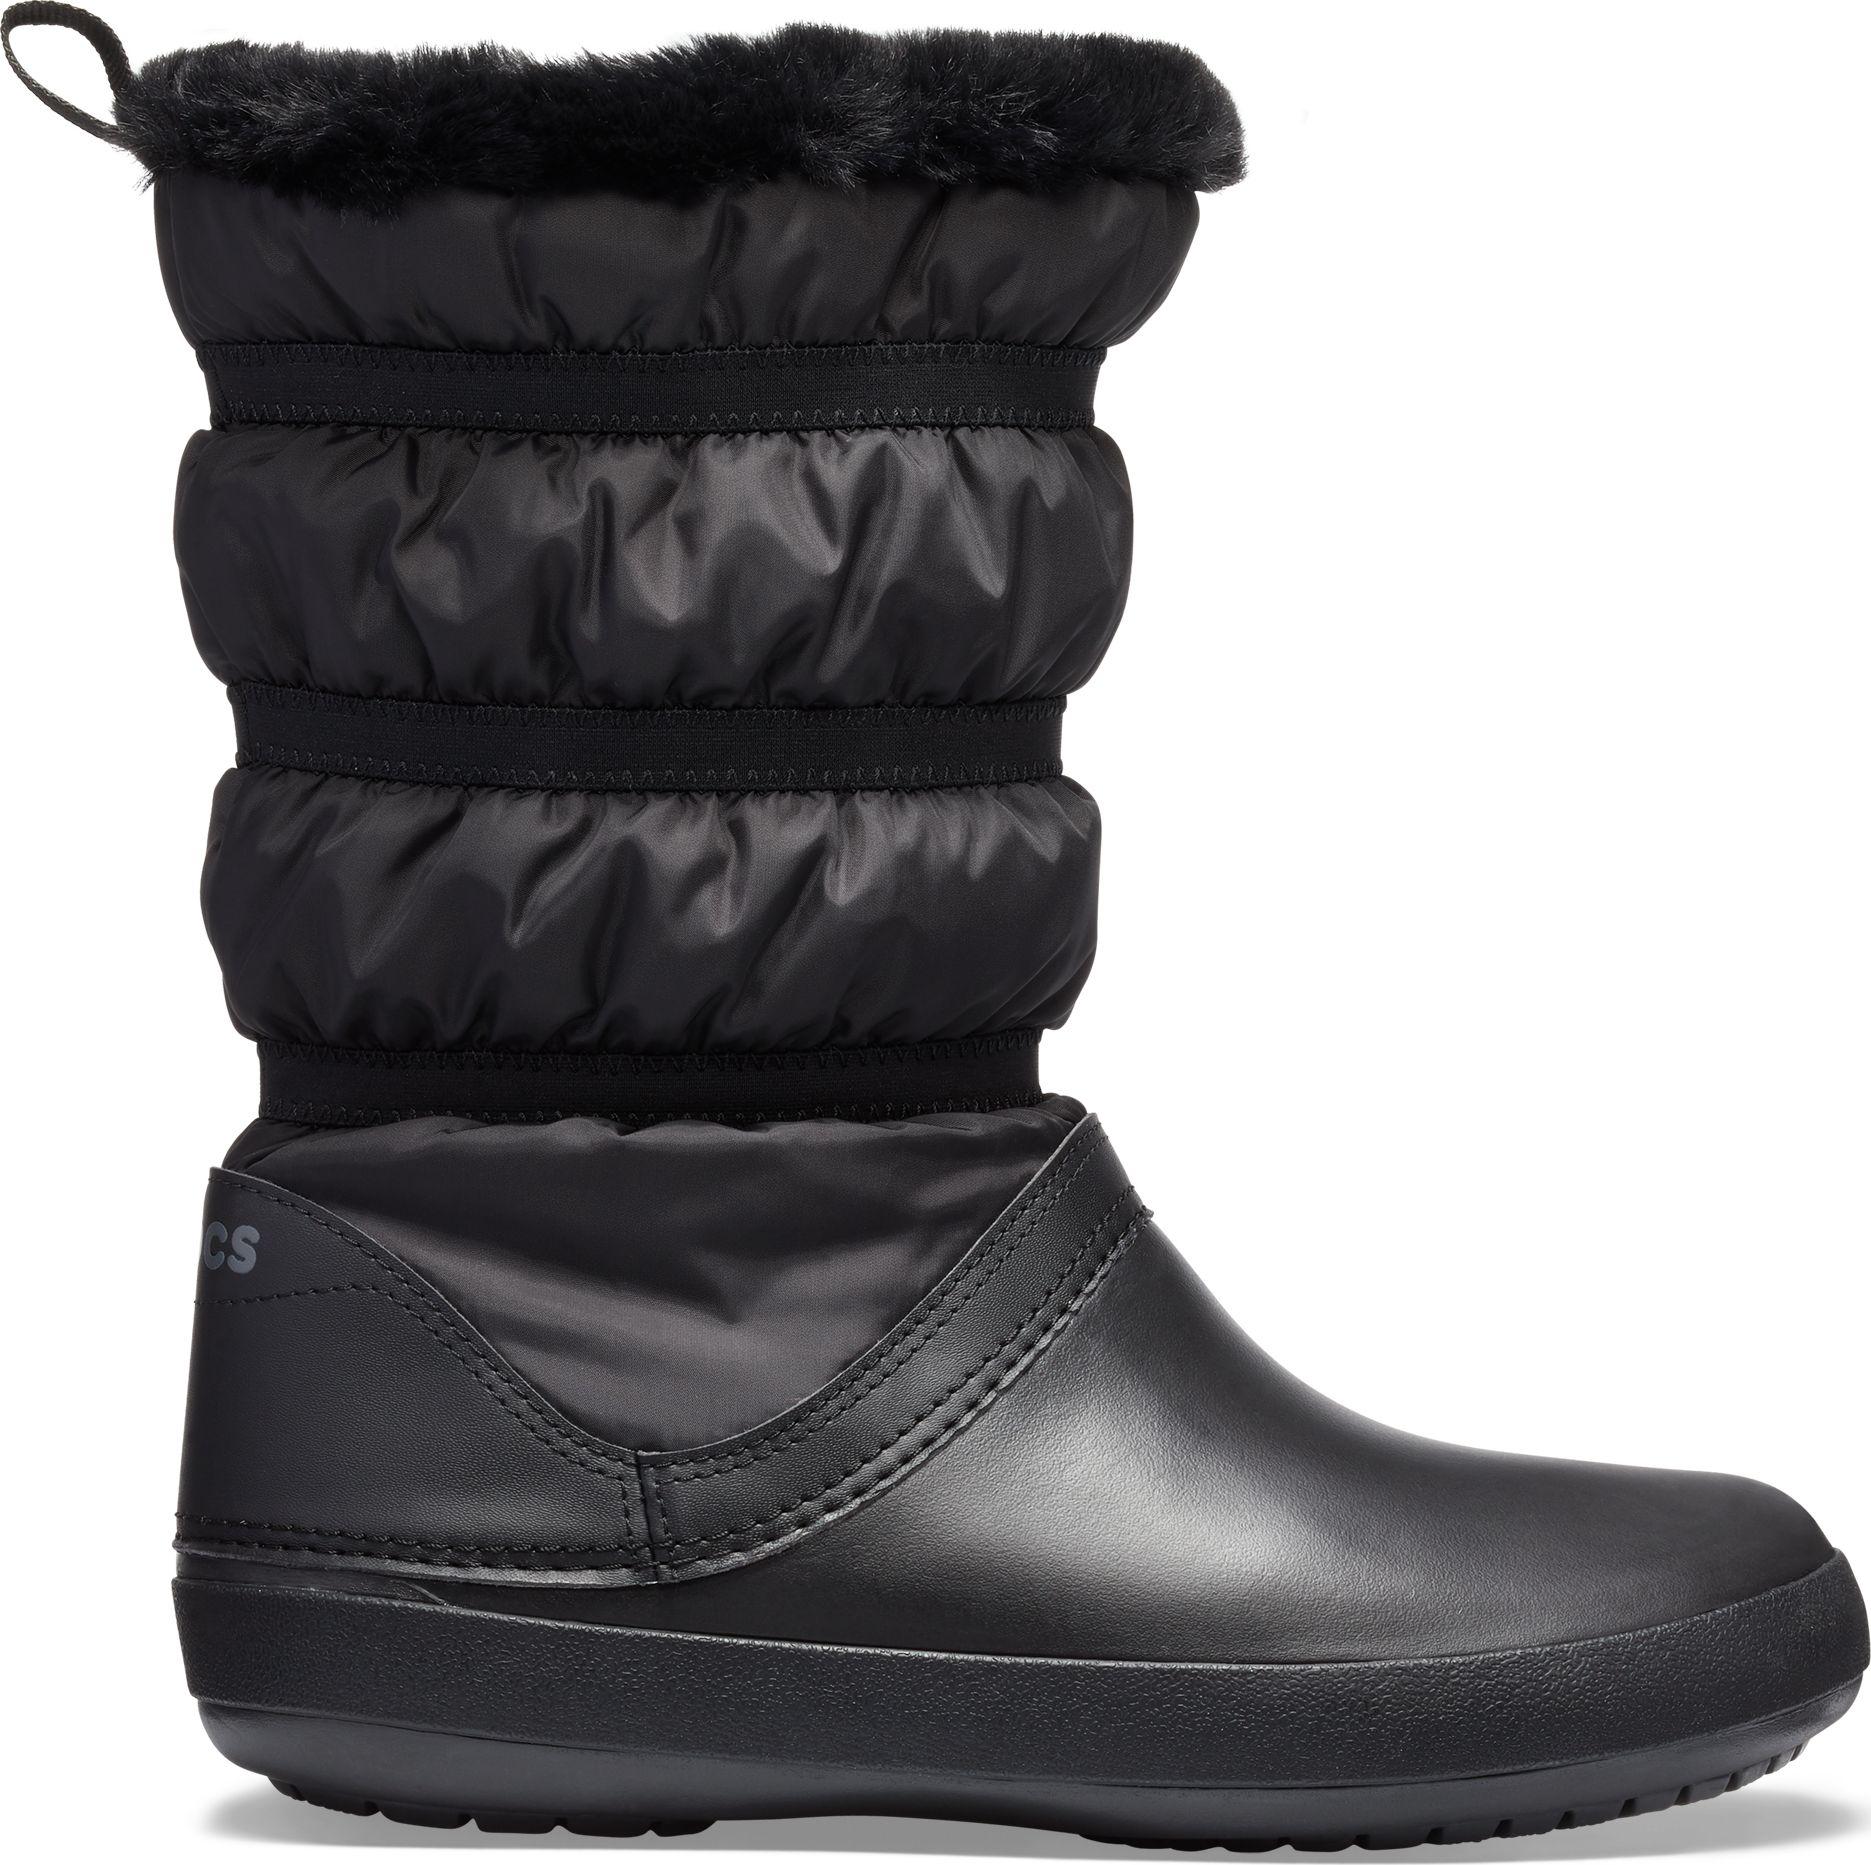 Crocs™ Women's Crocband Winter Boot Black/Black 42,5